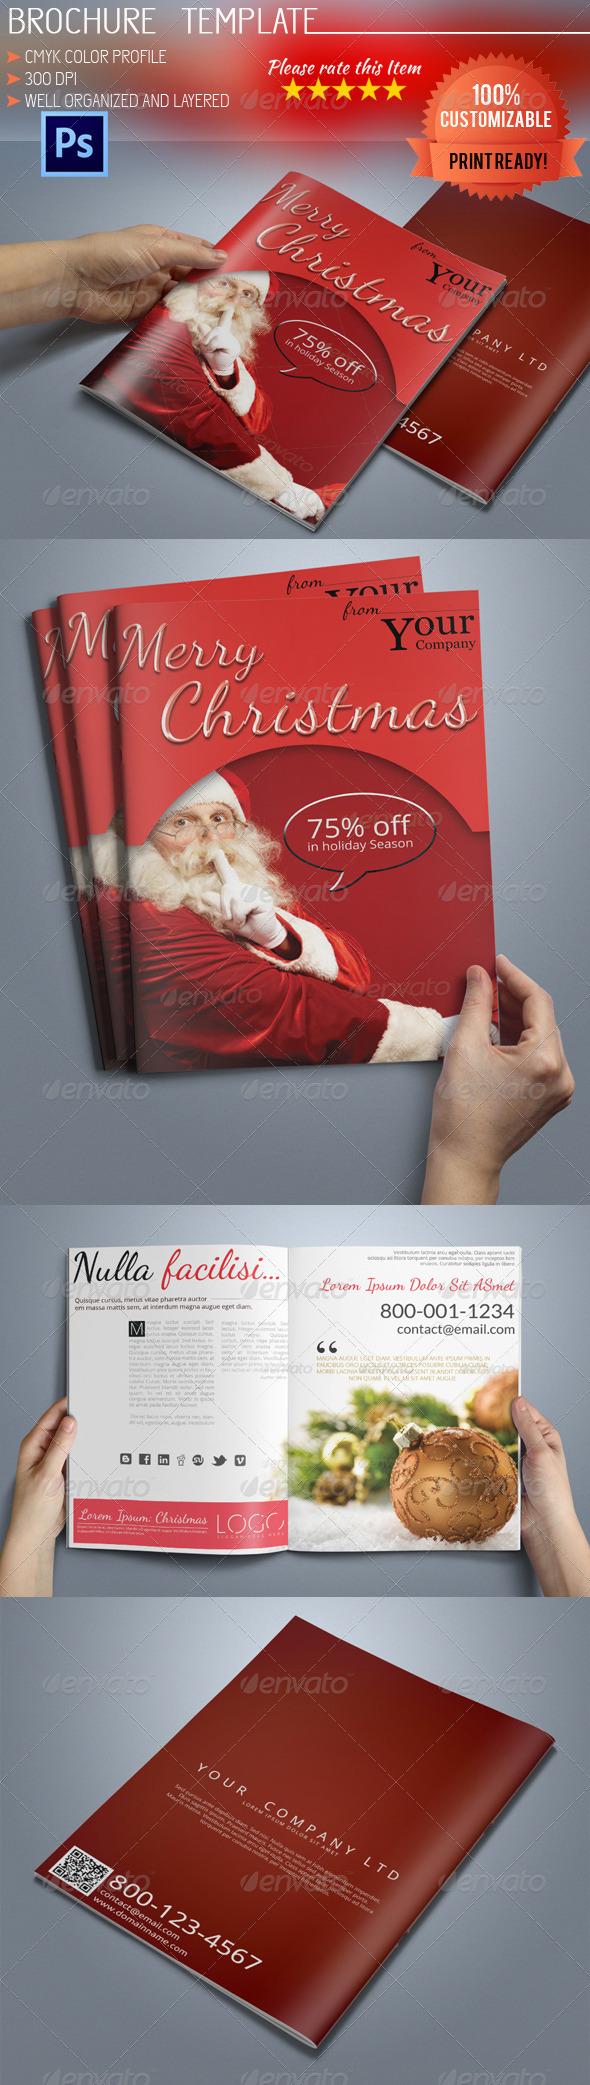 GraphicRiver A5 Christmas Brochure 6209788